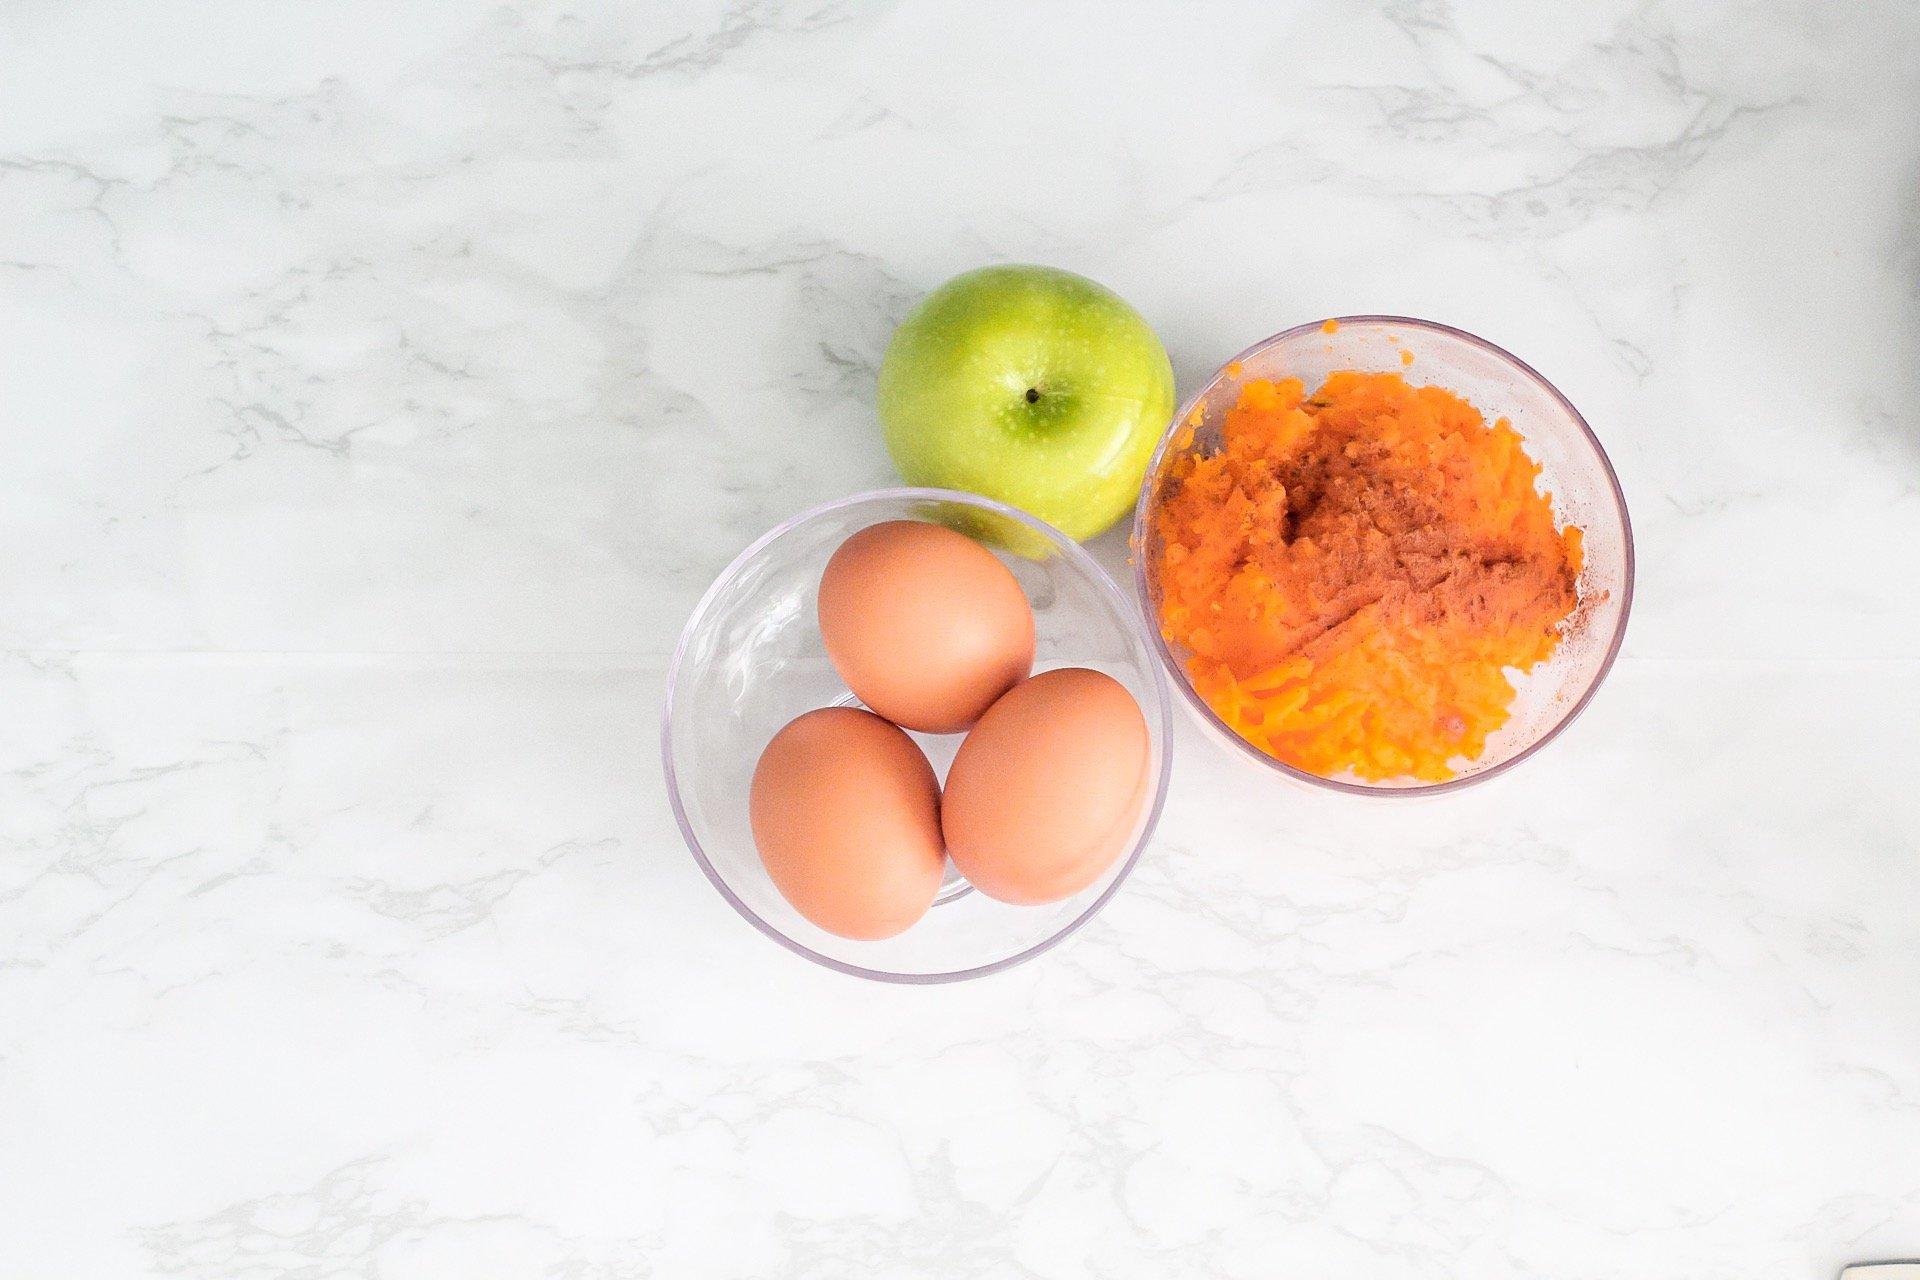 pregnancy diet yams eggs - slayathomemother.com